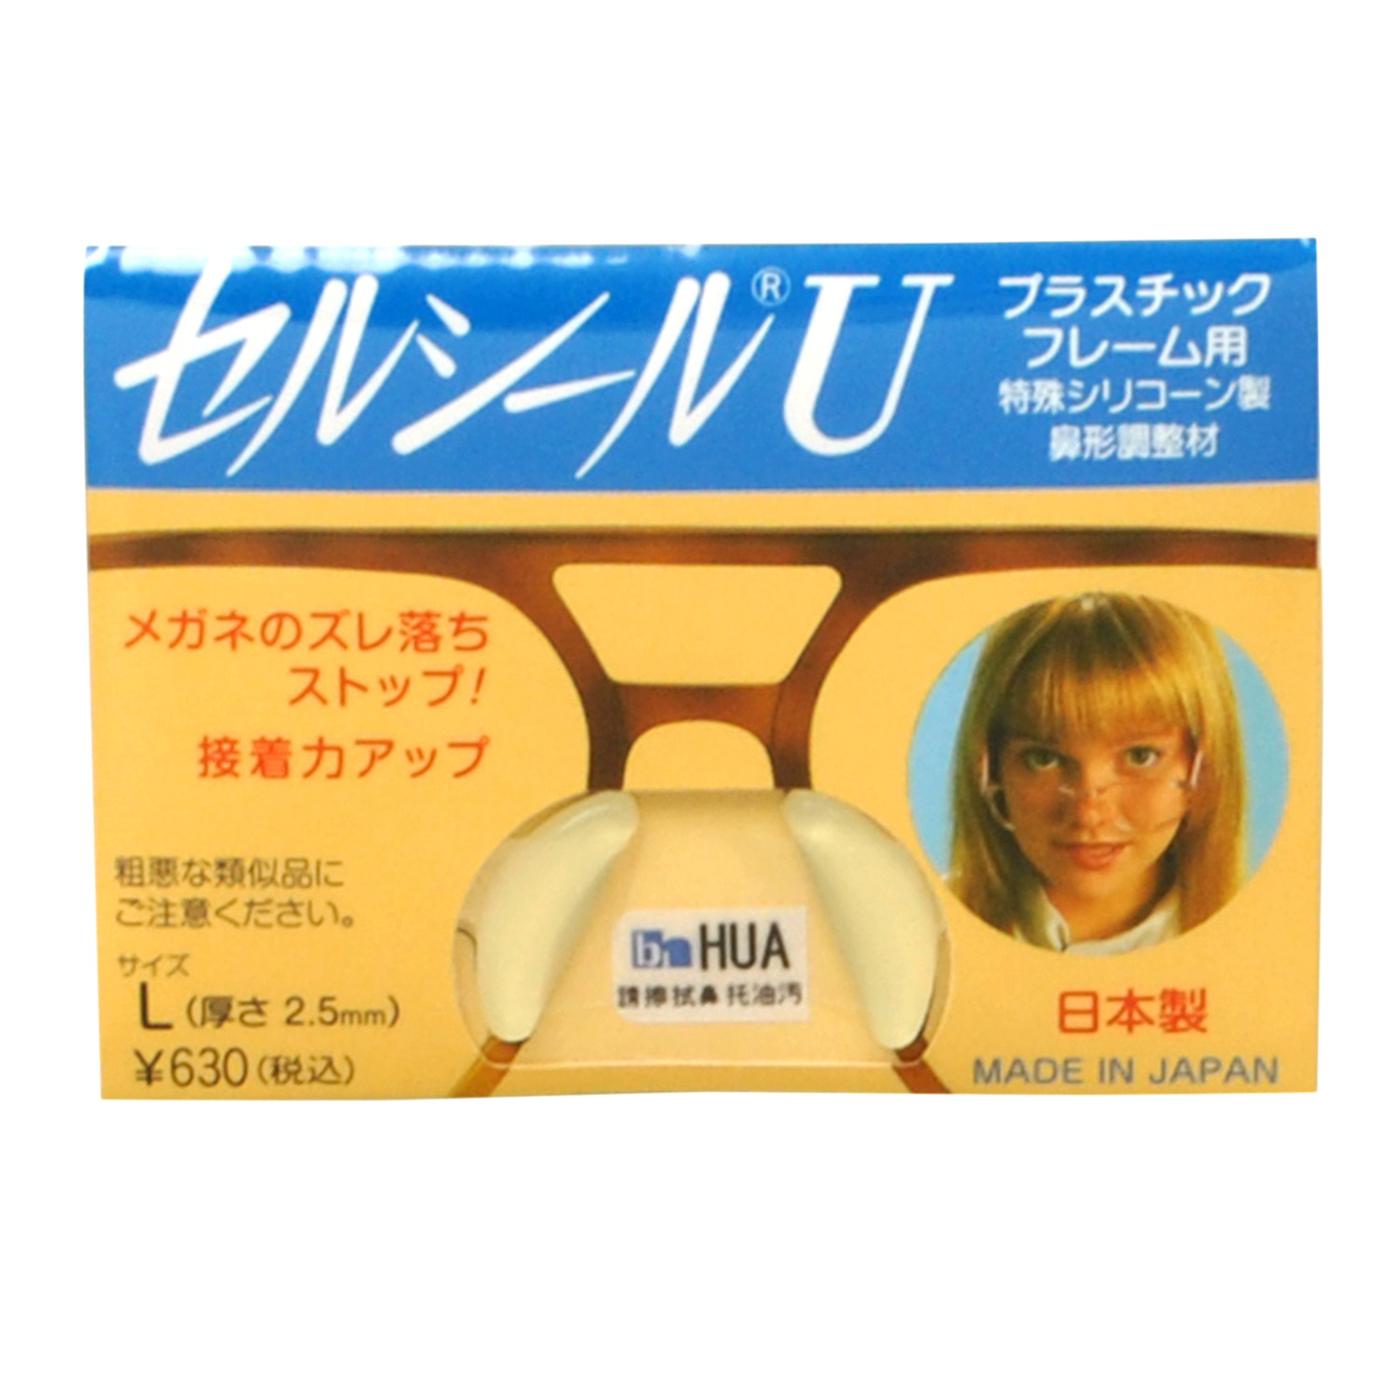 【Kelly C.】日本進口矽膠鼻墊貼(L-厚度2.5mm)